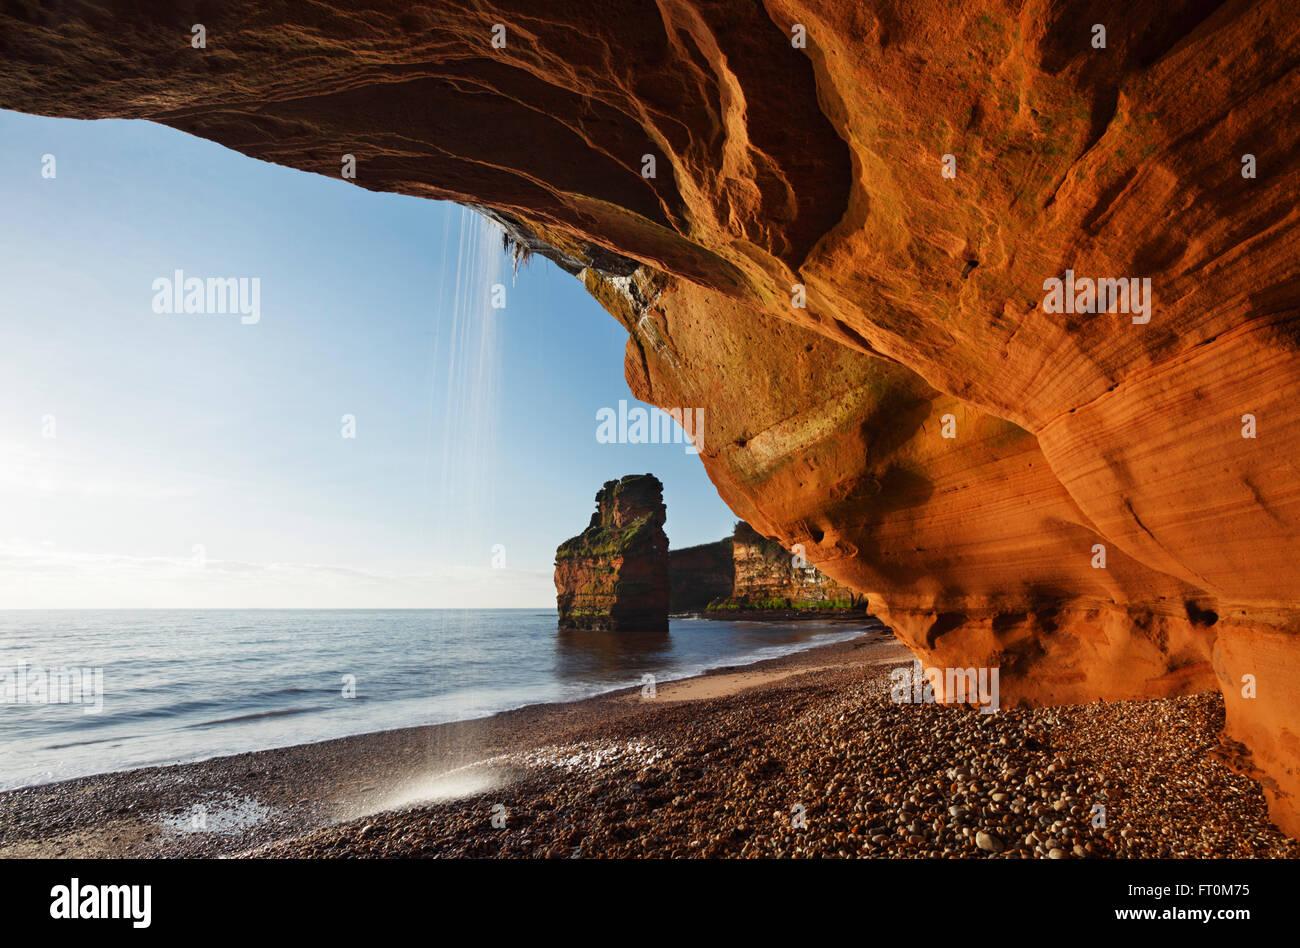 Ladram Bay. Jurassic Coast World Heritage Site. Devon. UK. - Stock Image